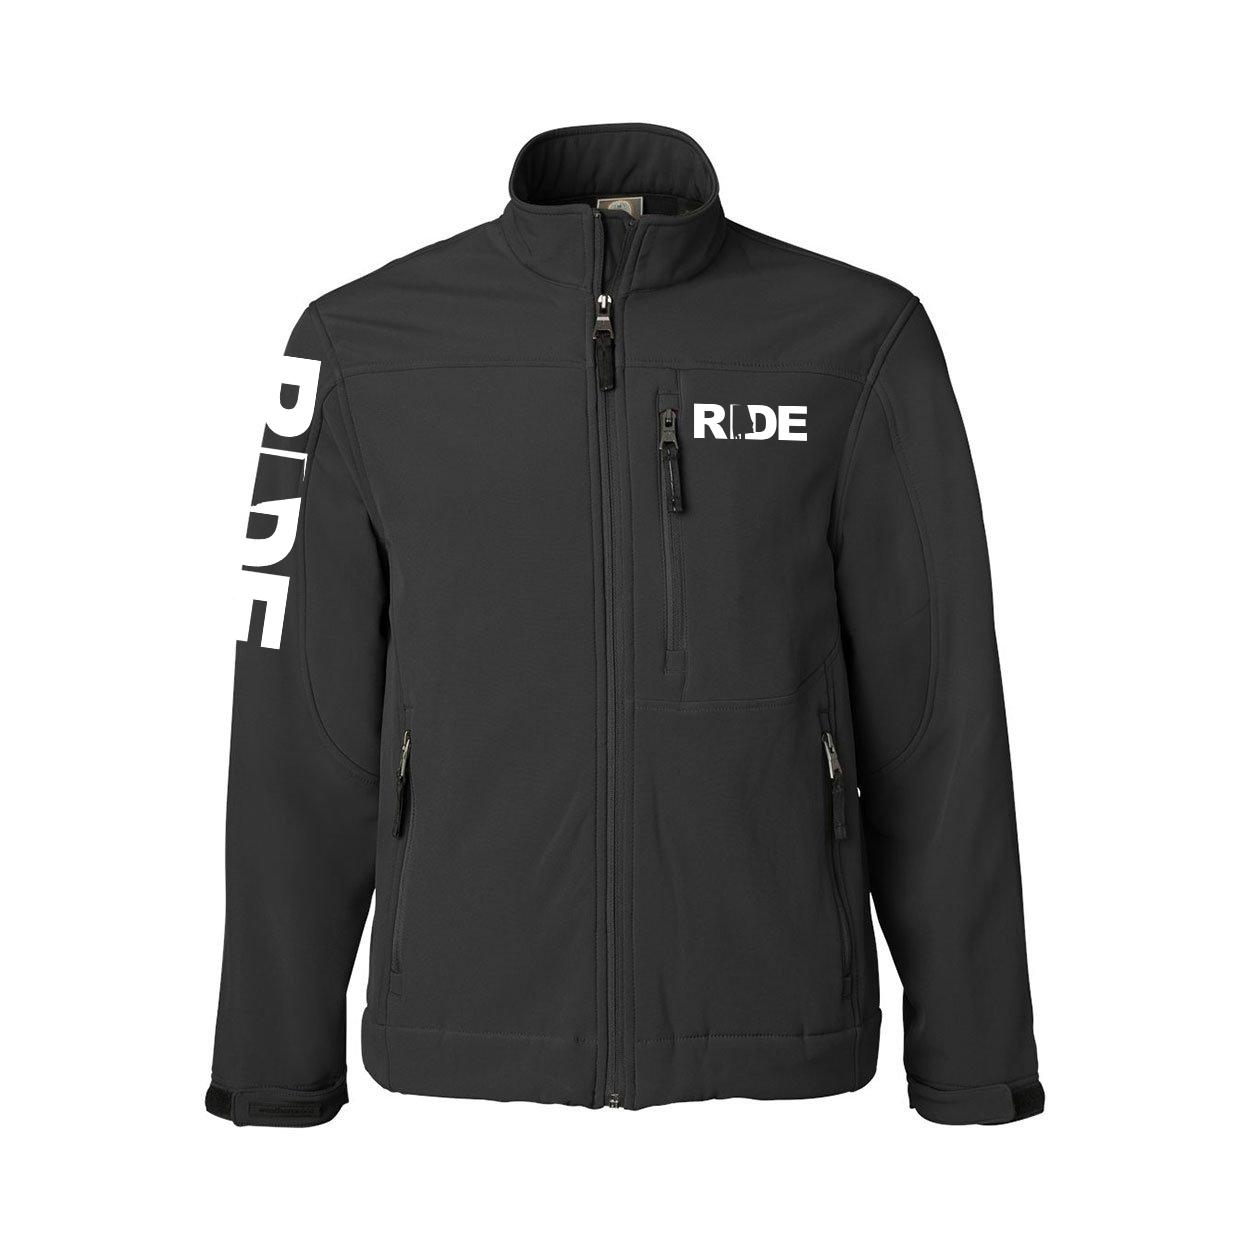 Ride Alabama Classic Soft Shell Weatherproof Jacket (White Logo)